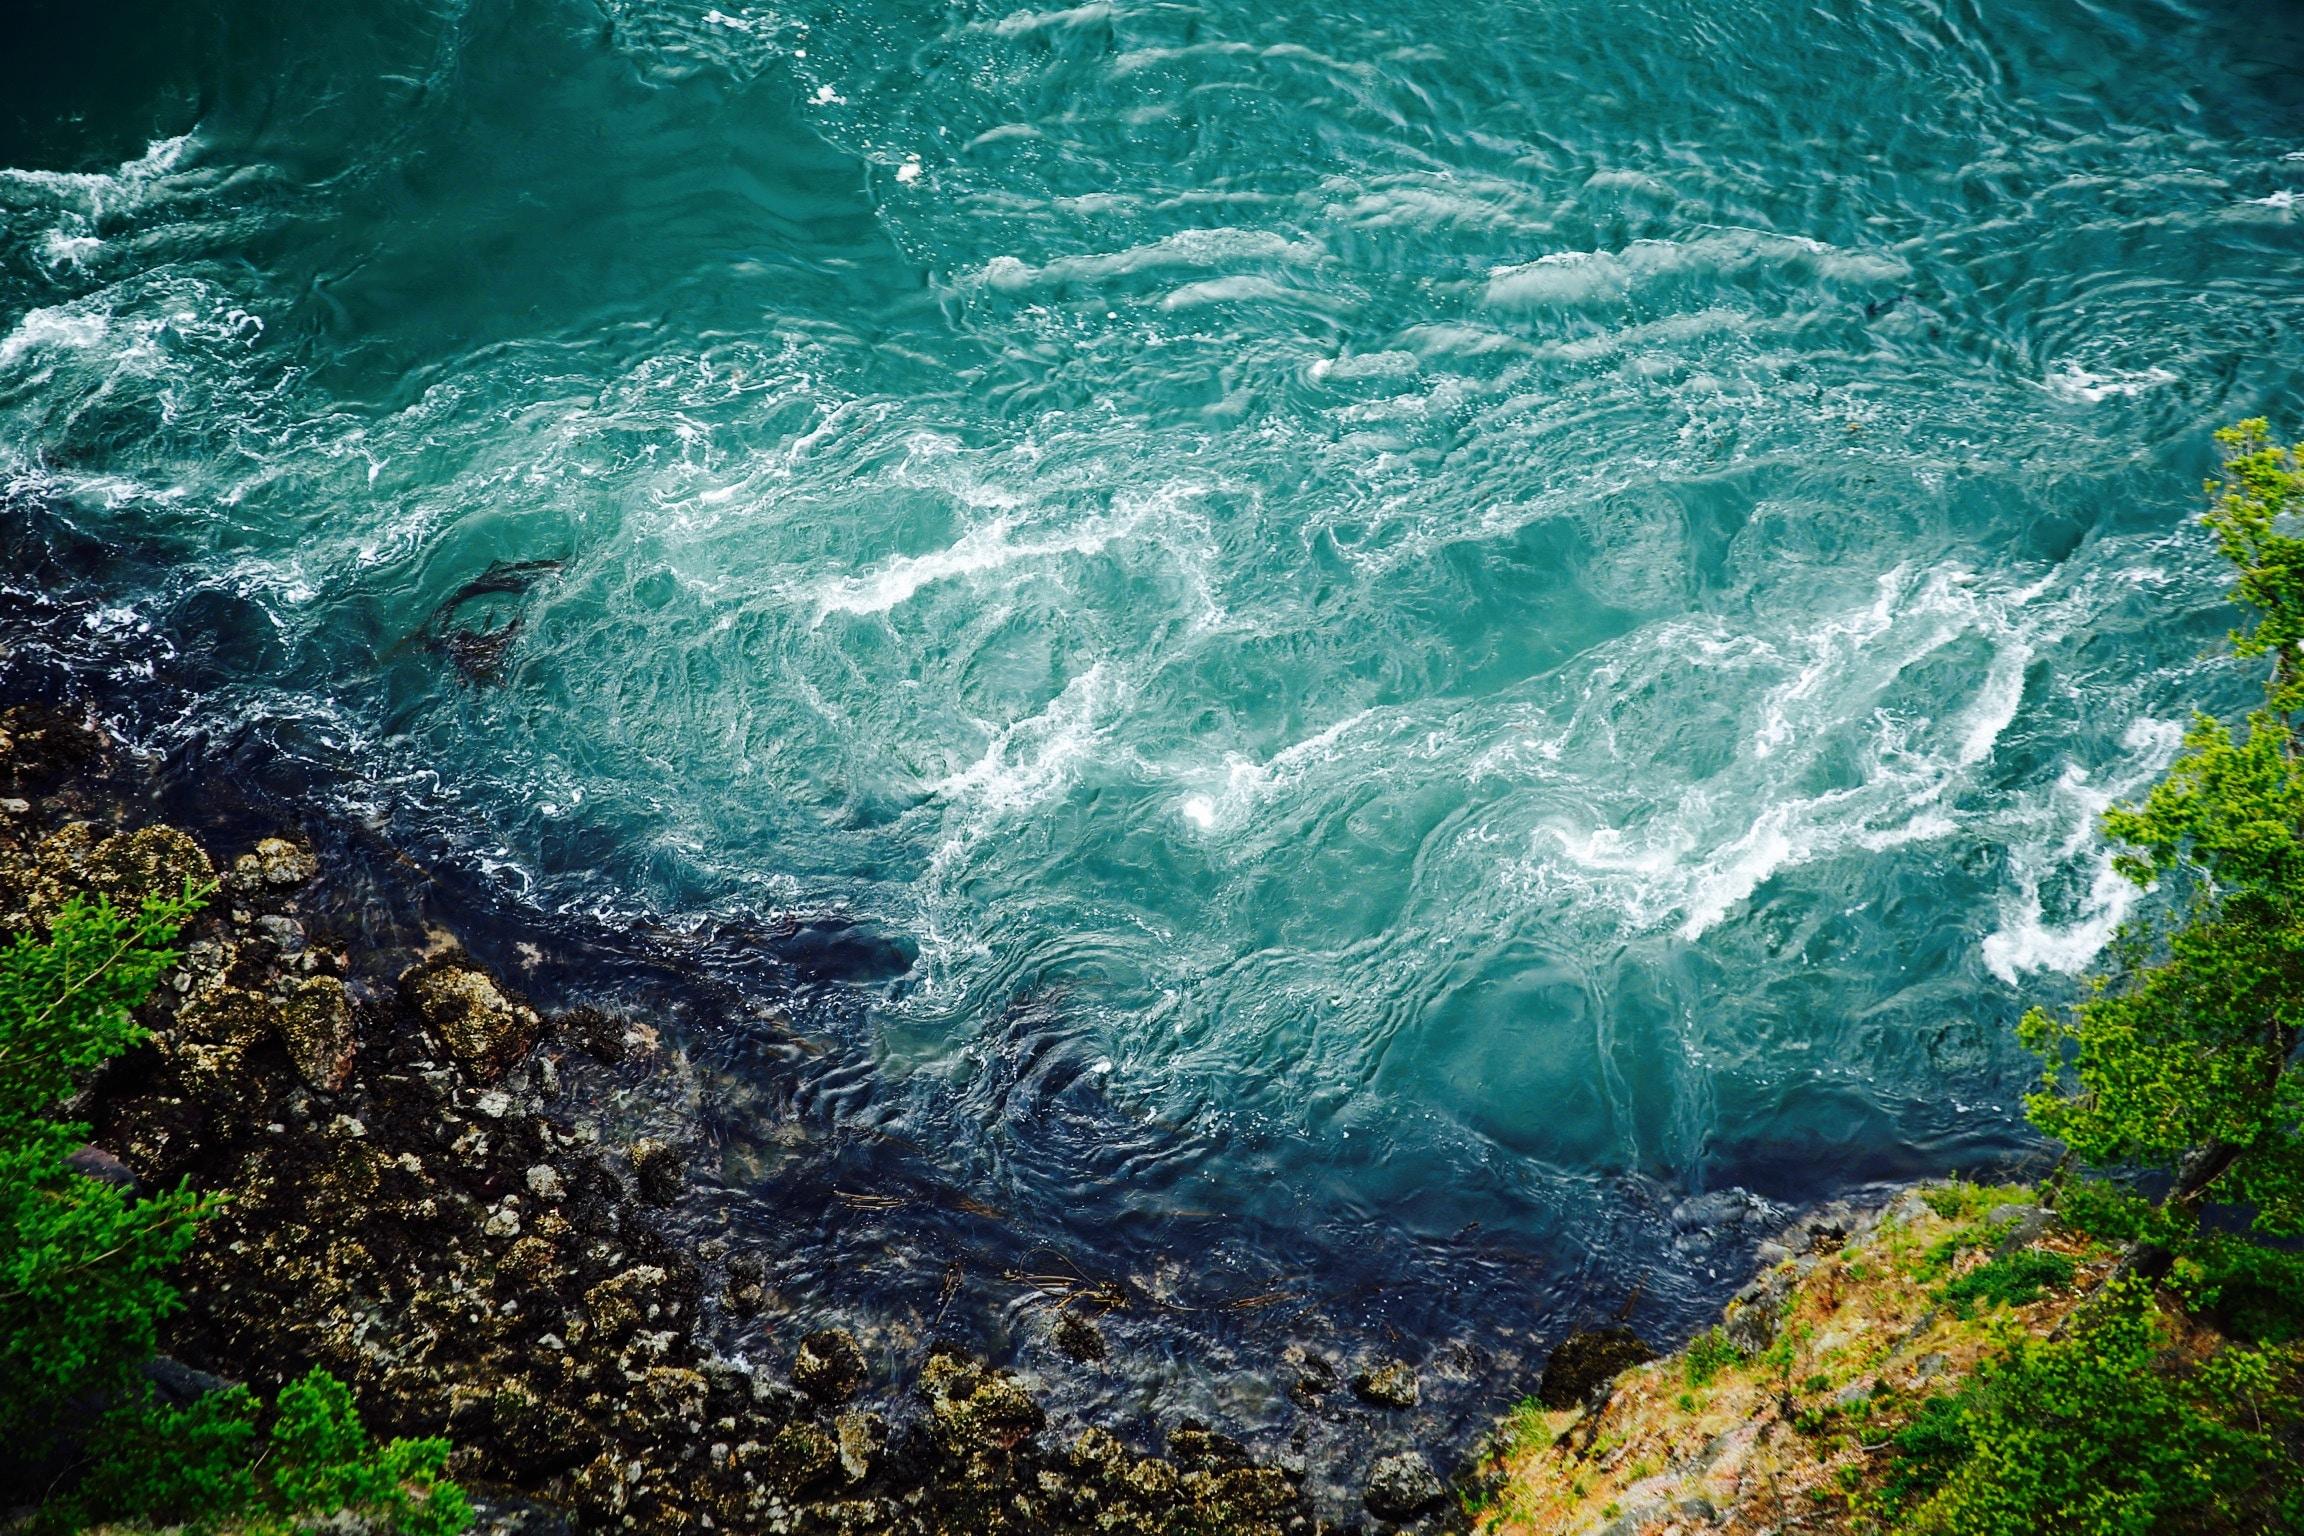 bird's-eye view photography of body of water smashing the rocks